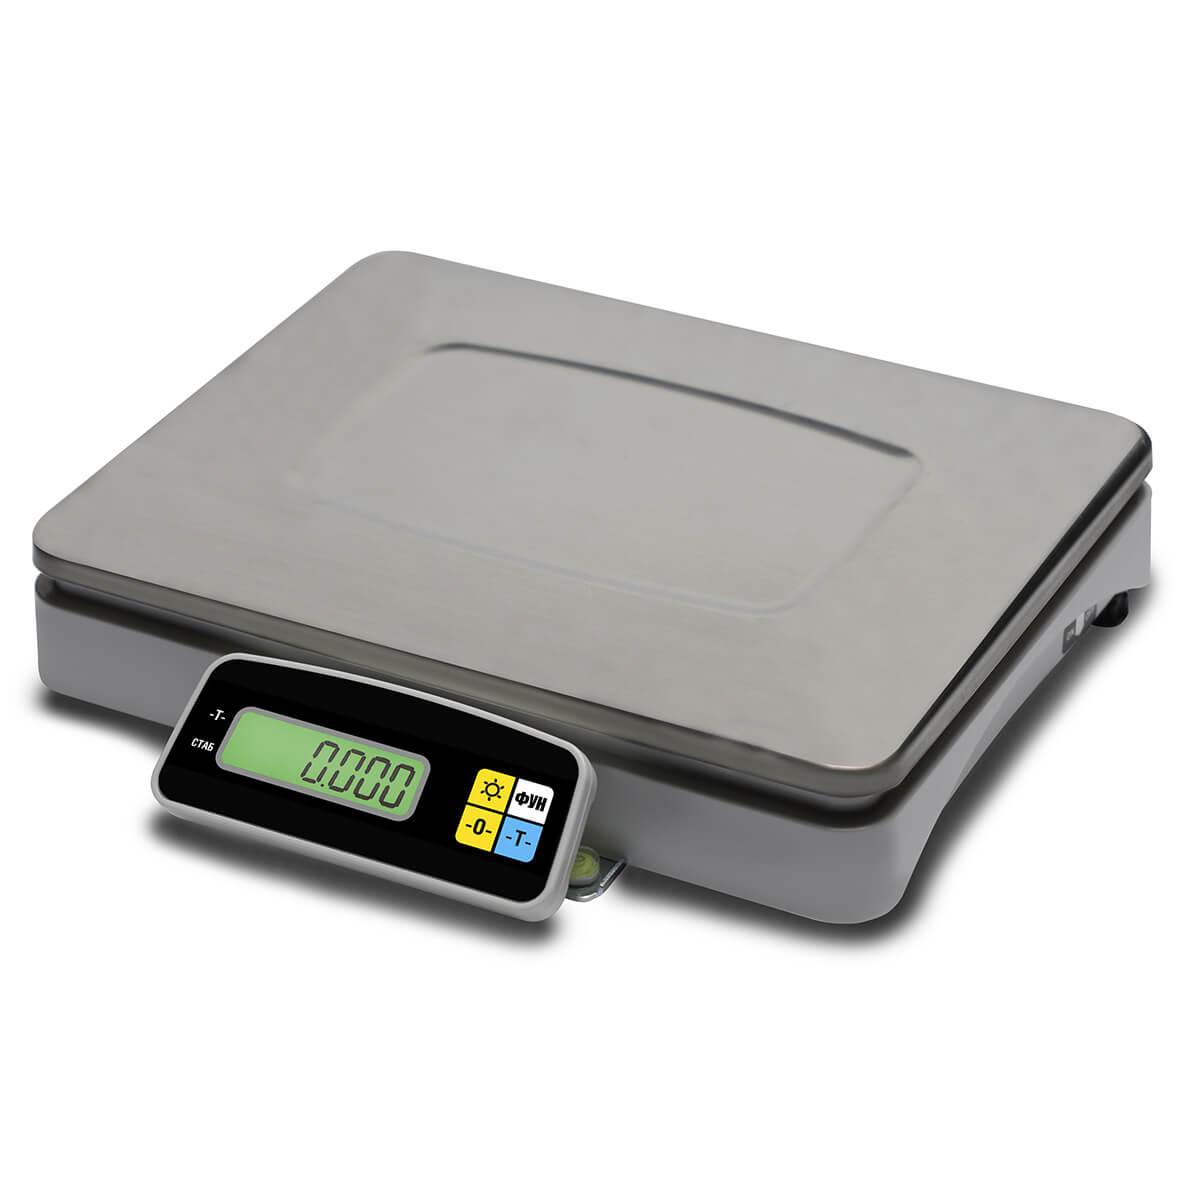 Фасовочные настольные весы M-ER 222 F-15.2 «Connect» LCD RS-232